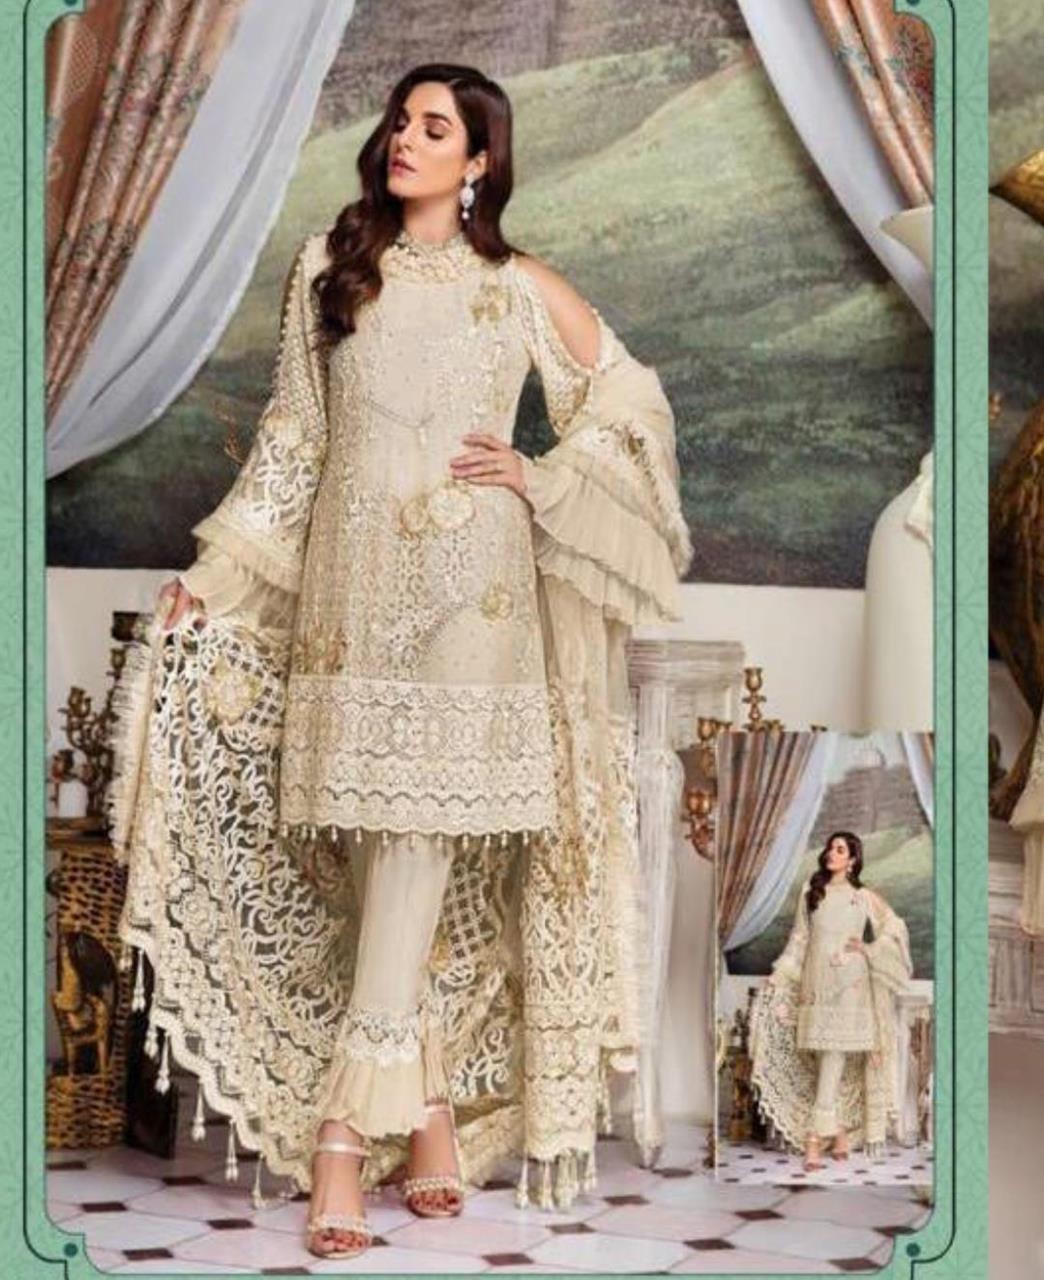 Embroidered Georgette Straight cut Salwar Kameez in Cream